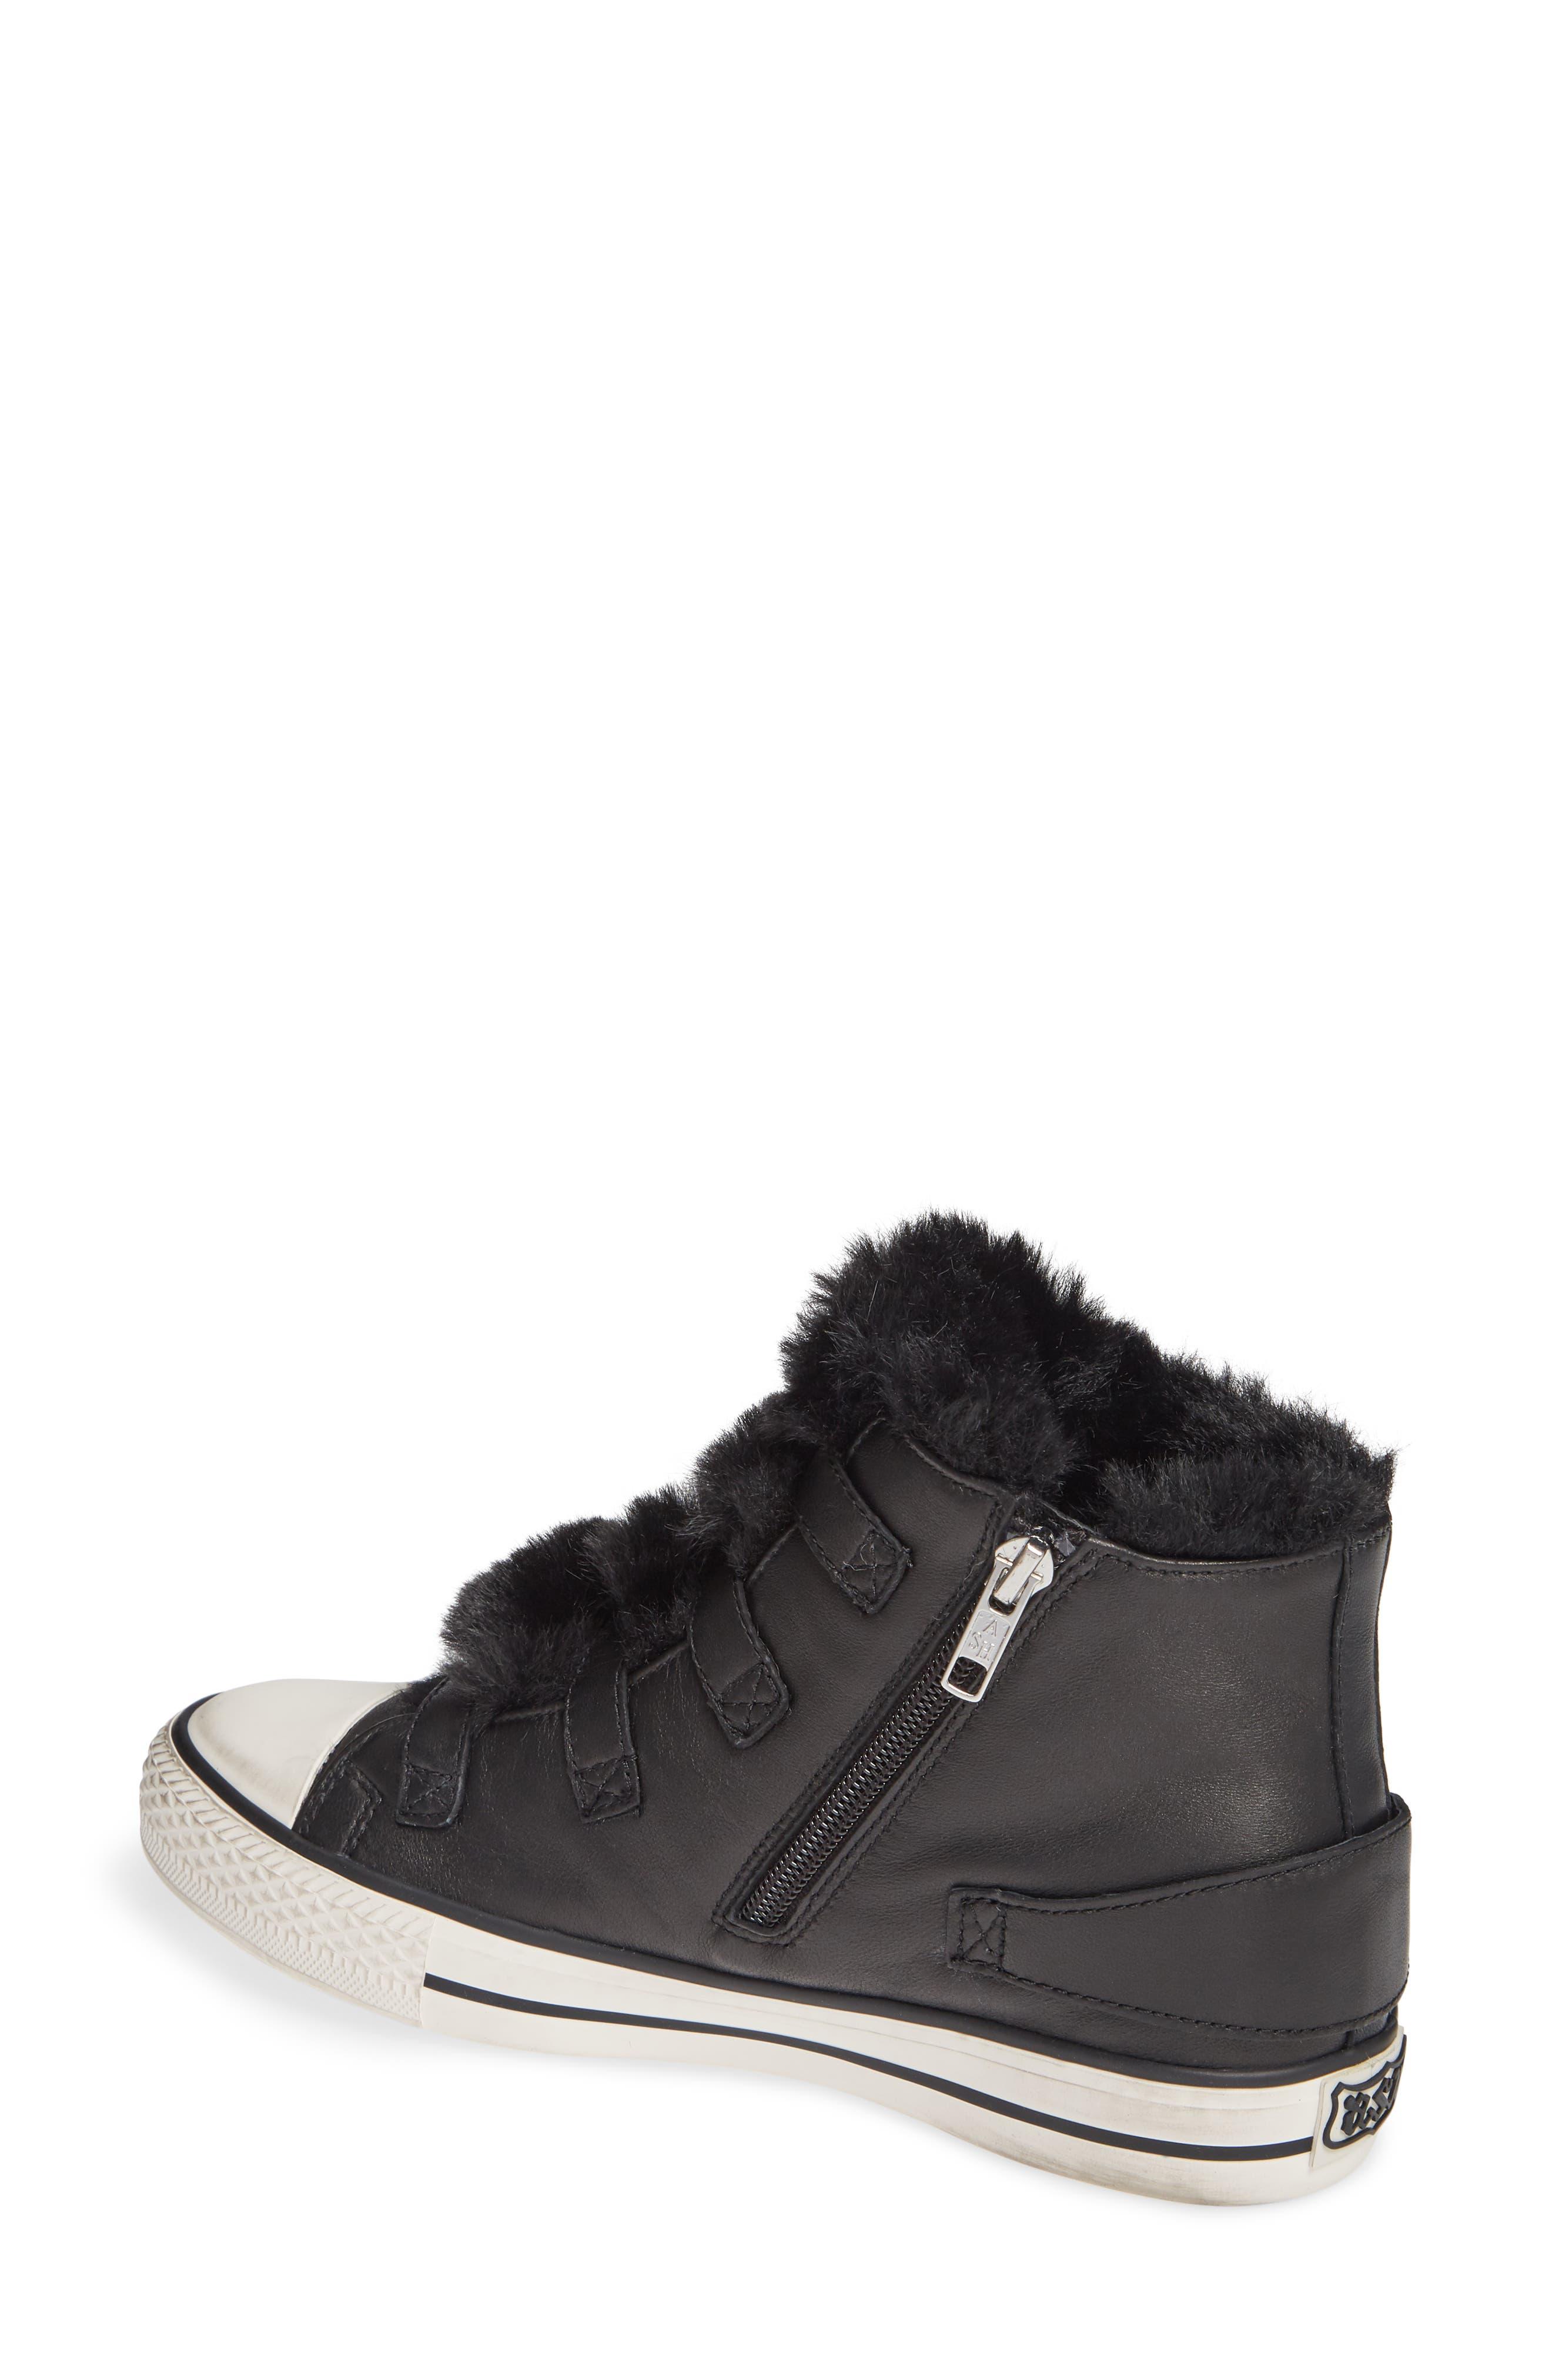 ASH, Valko High Top Sneaker, Alternate thumbnail 2, color, BLACK/ BLACK FAUX FUR